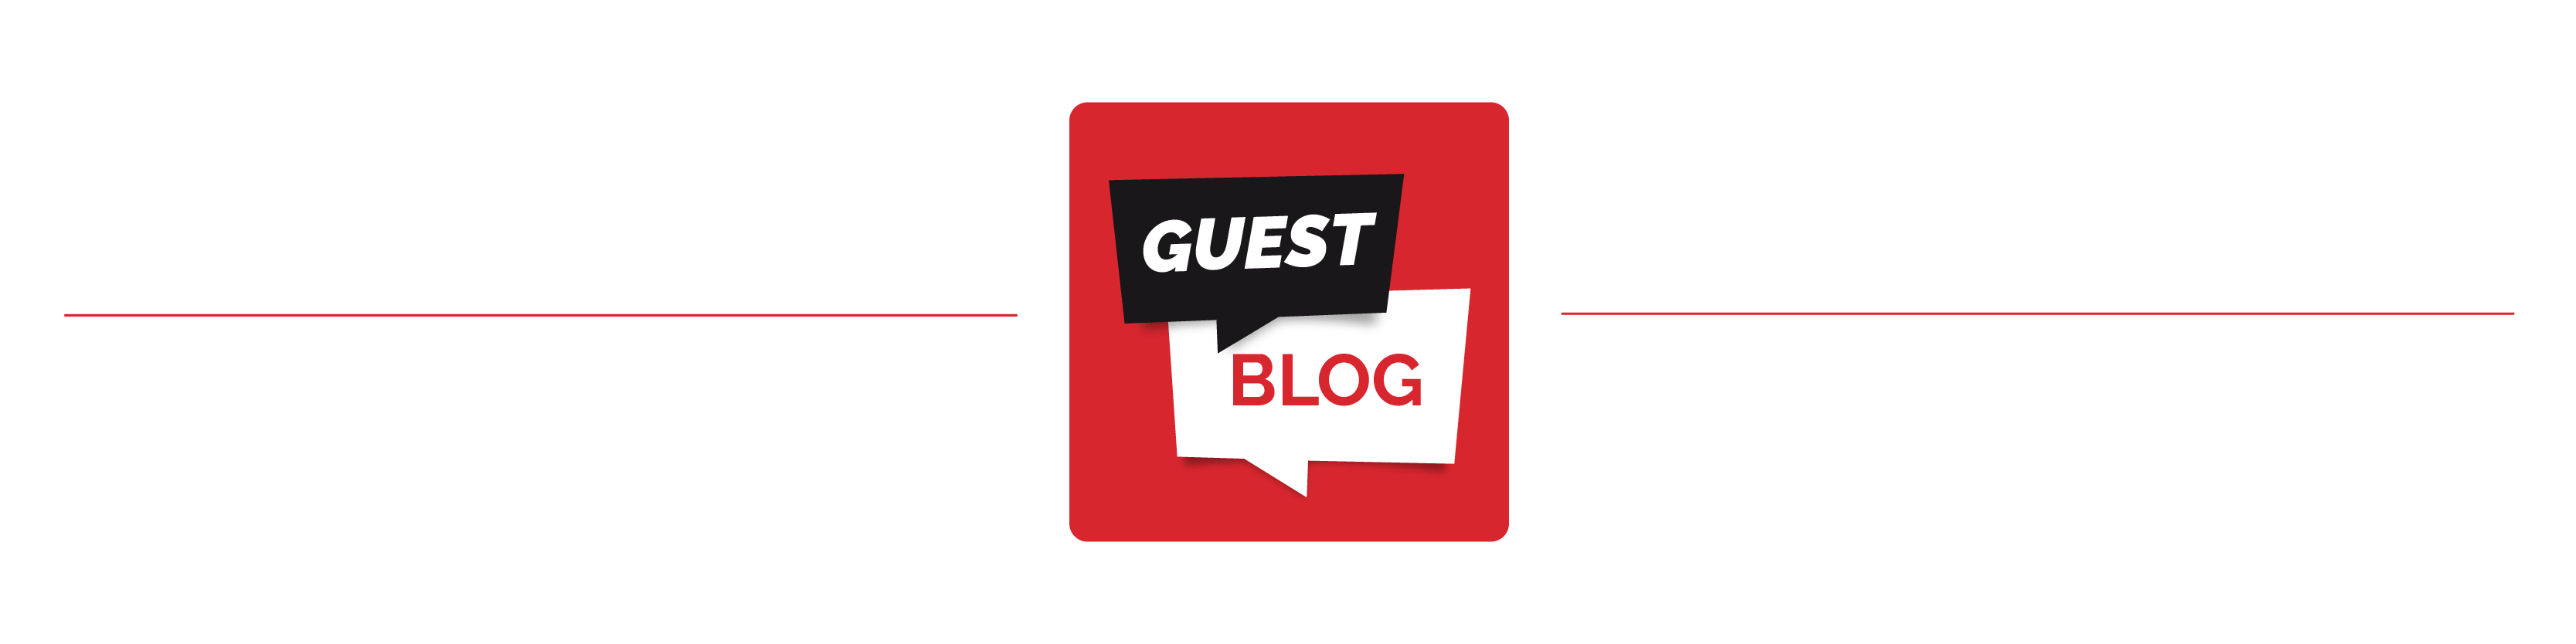 Guest Blog Banner-01